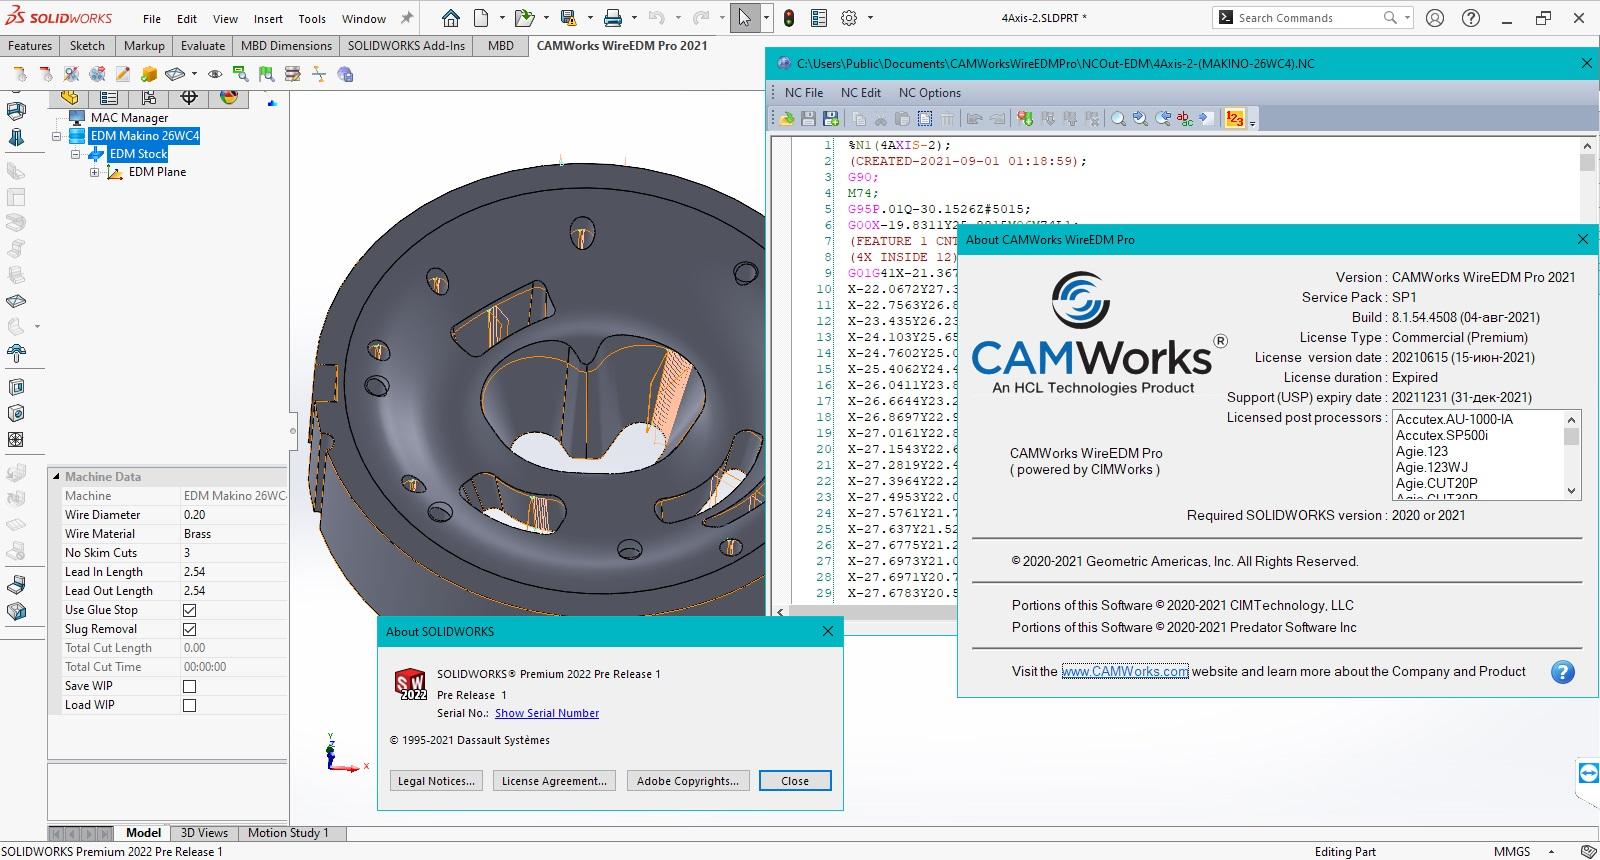 programming with CAMWorks WireEDM Pro 2021 SP1